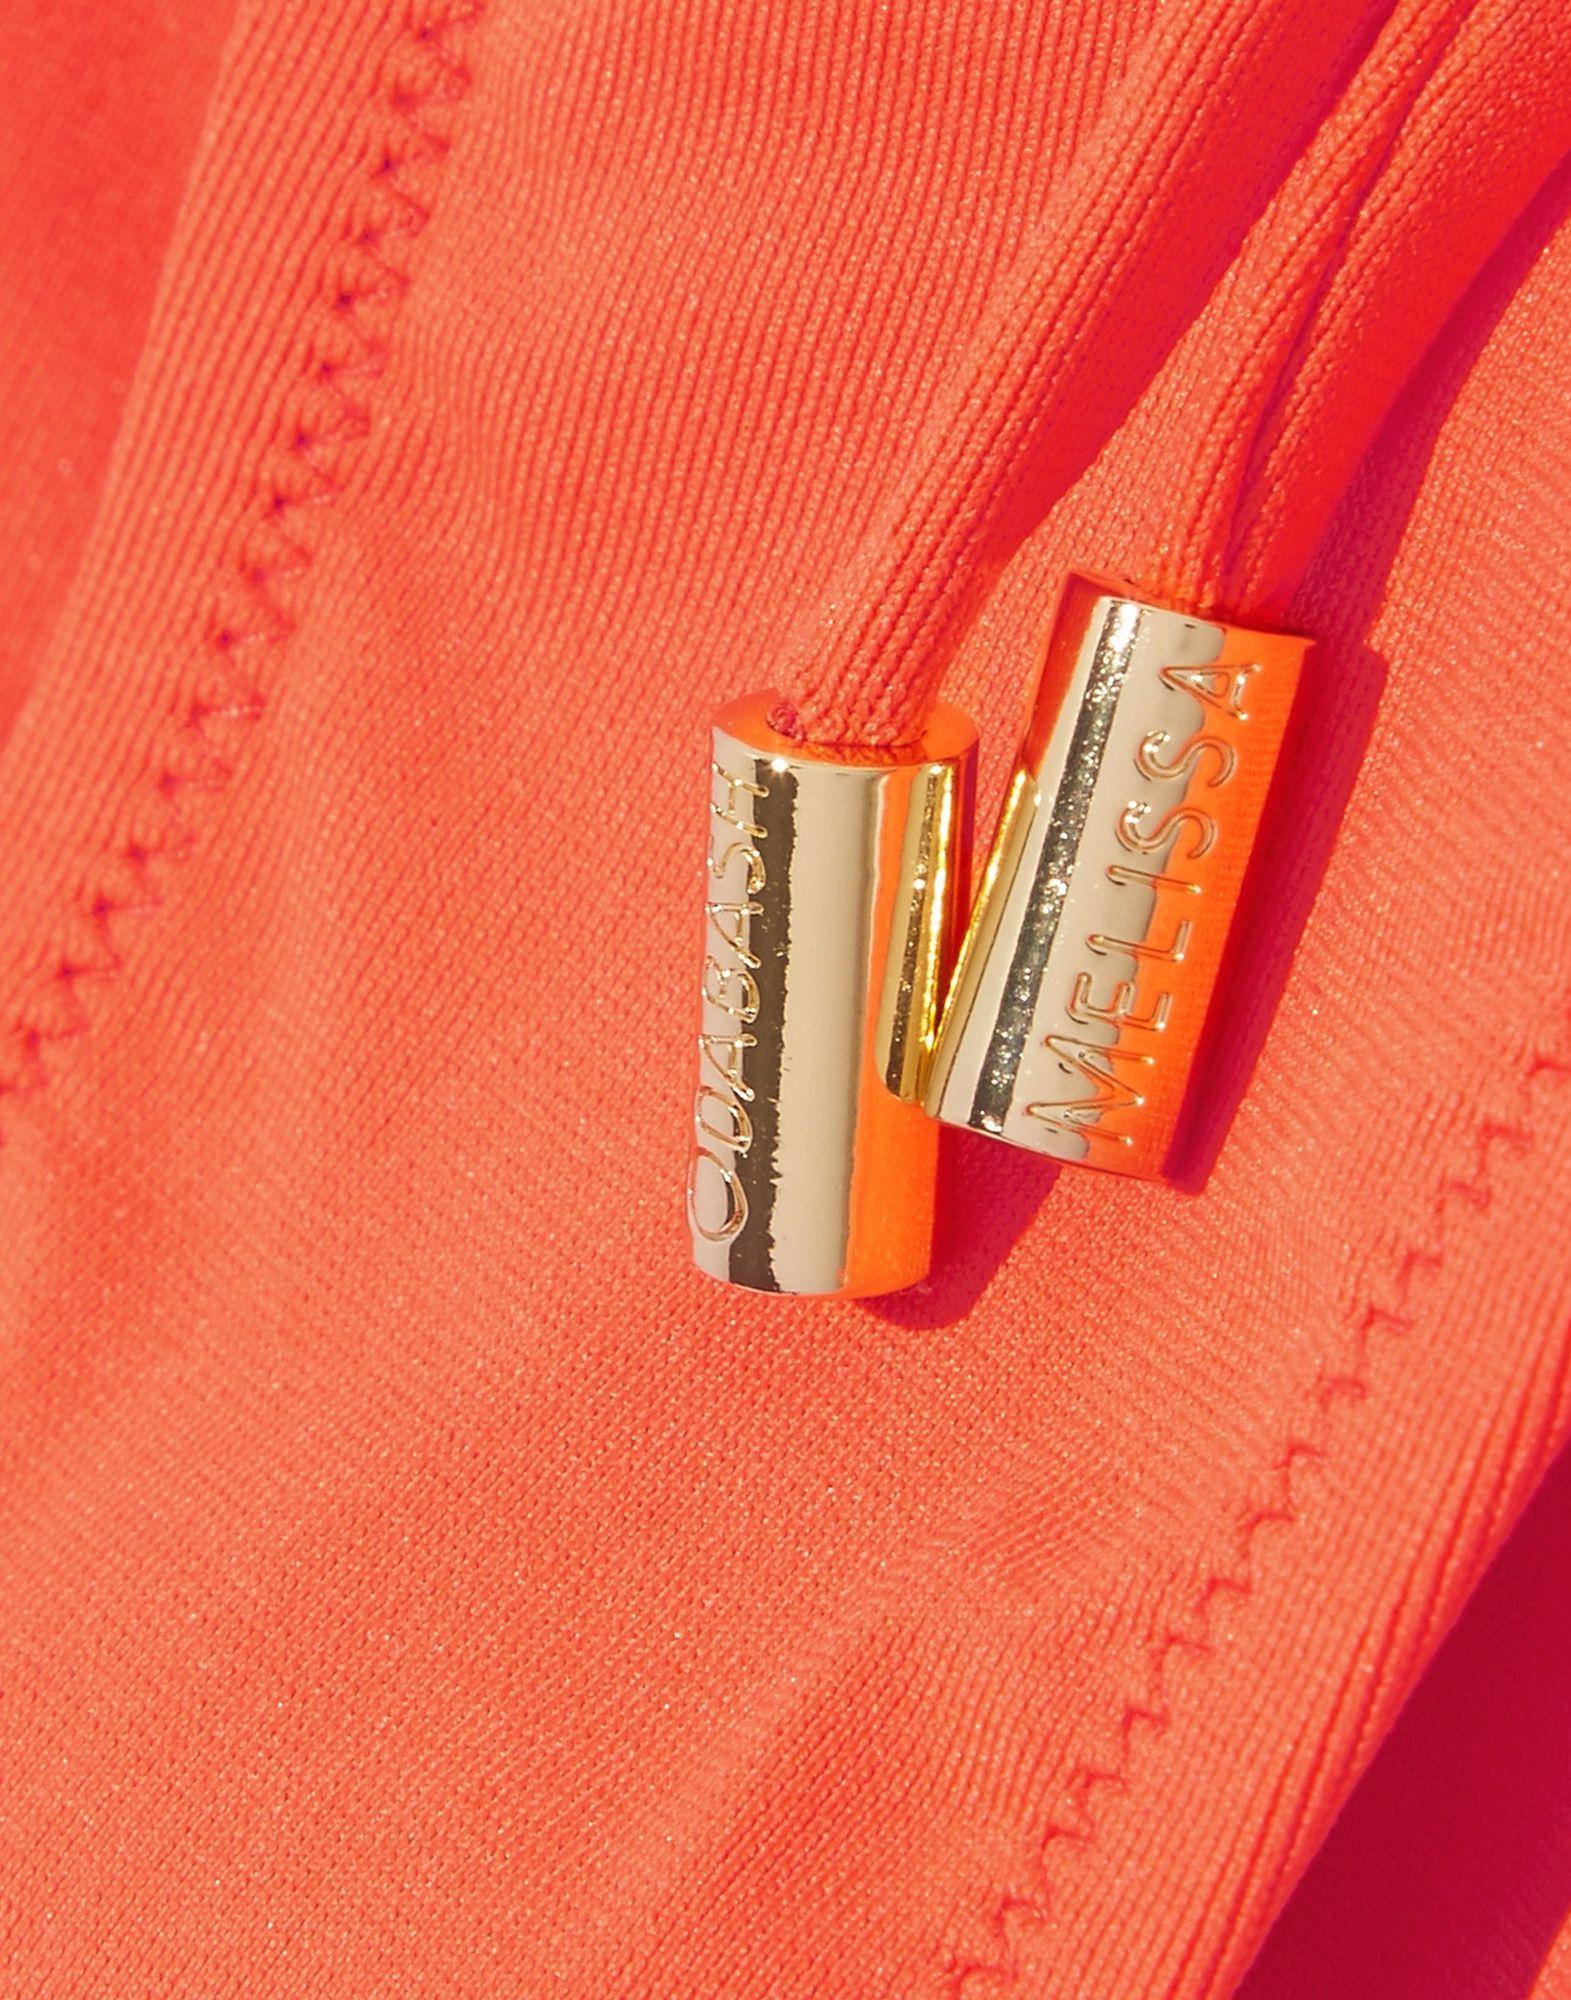 Biquini Melissa Odabash de color Naranja